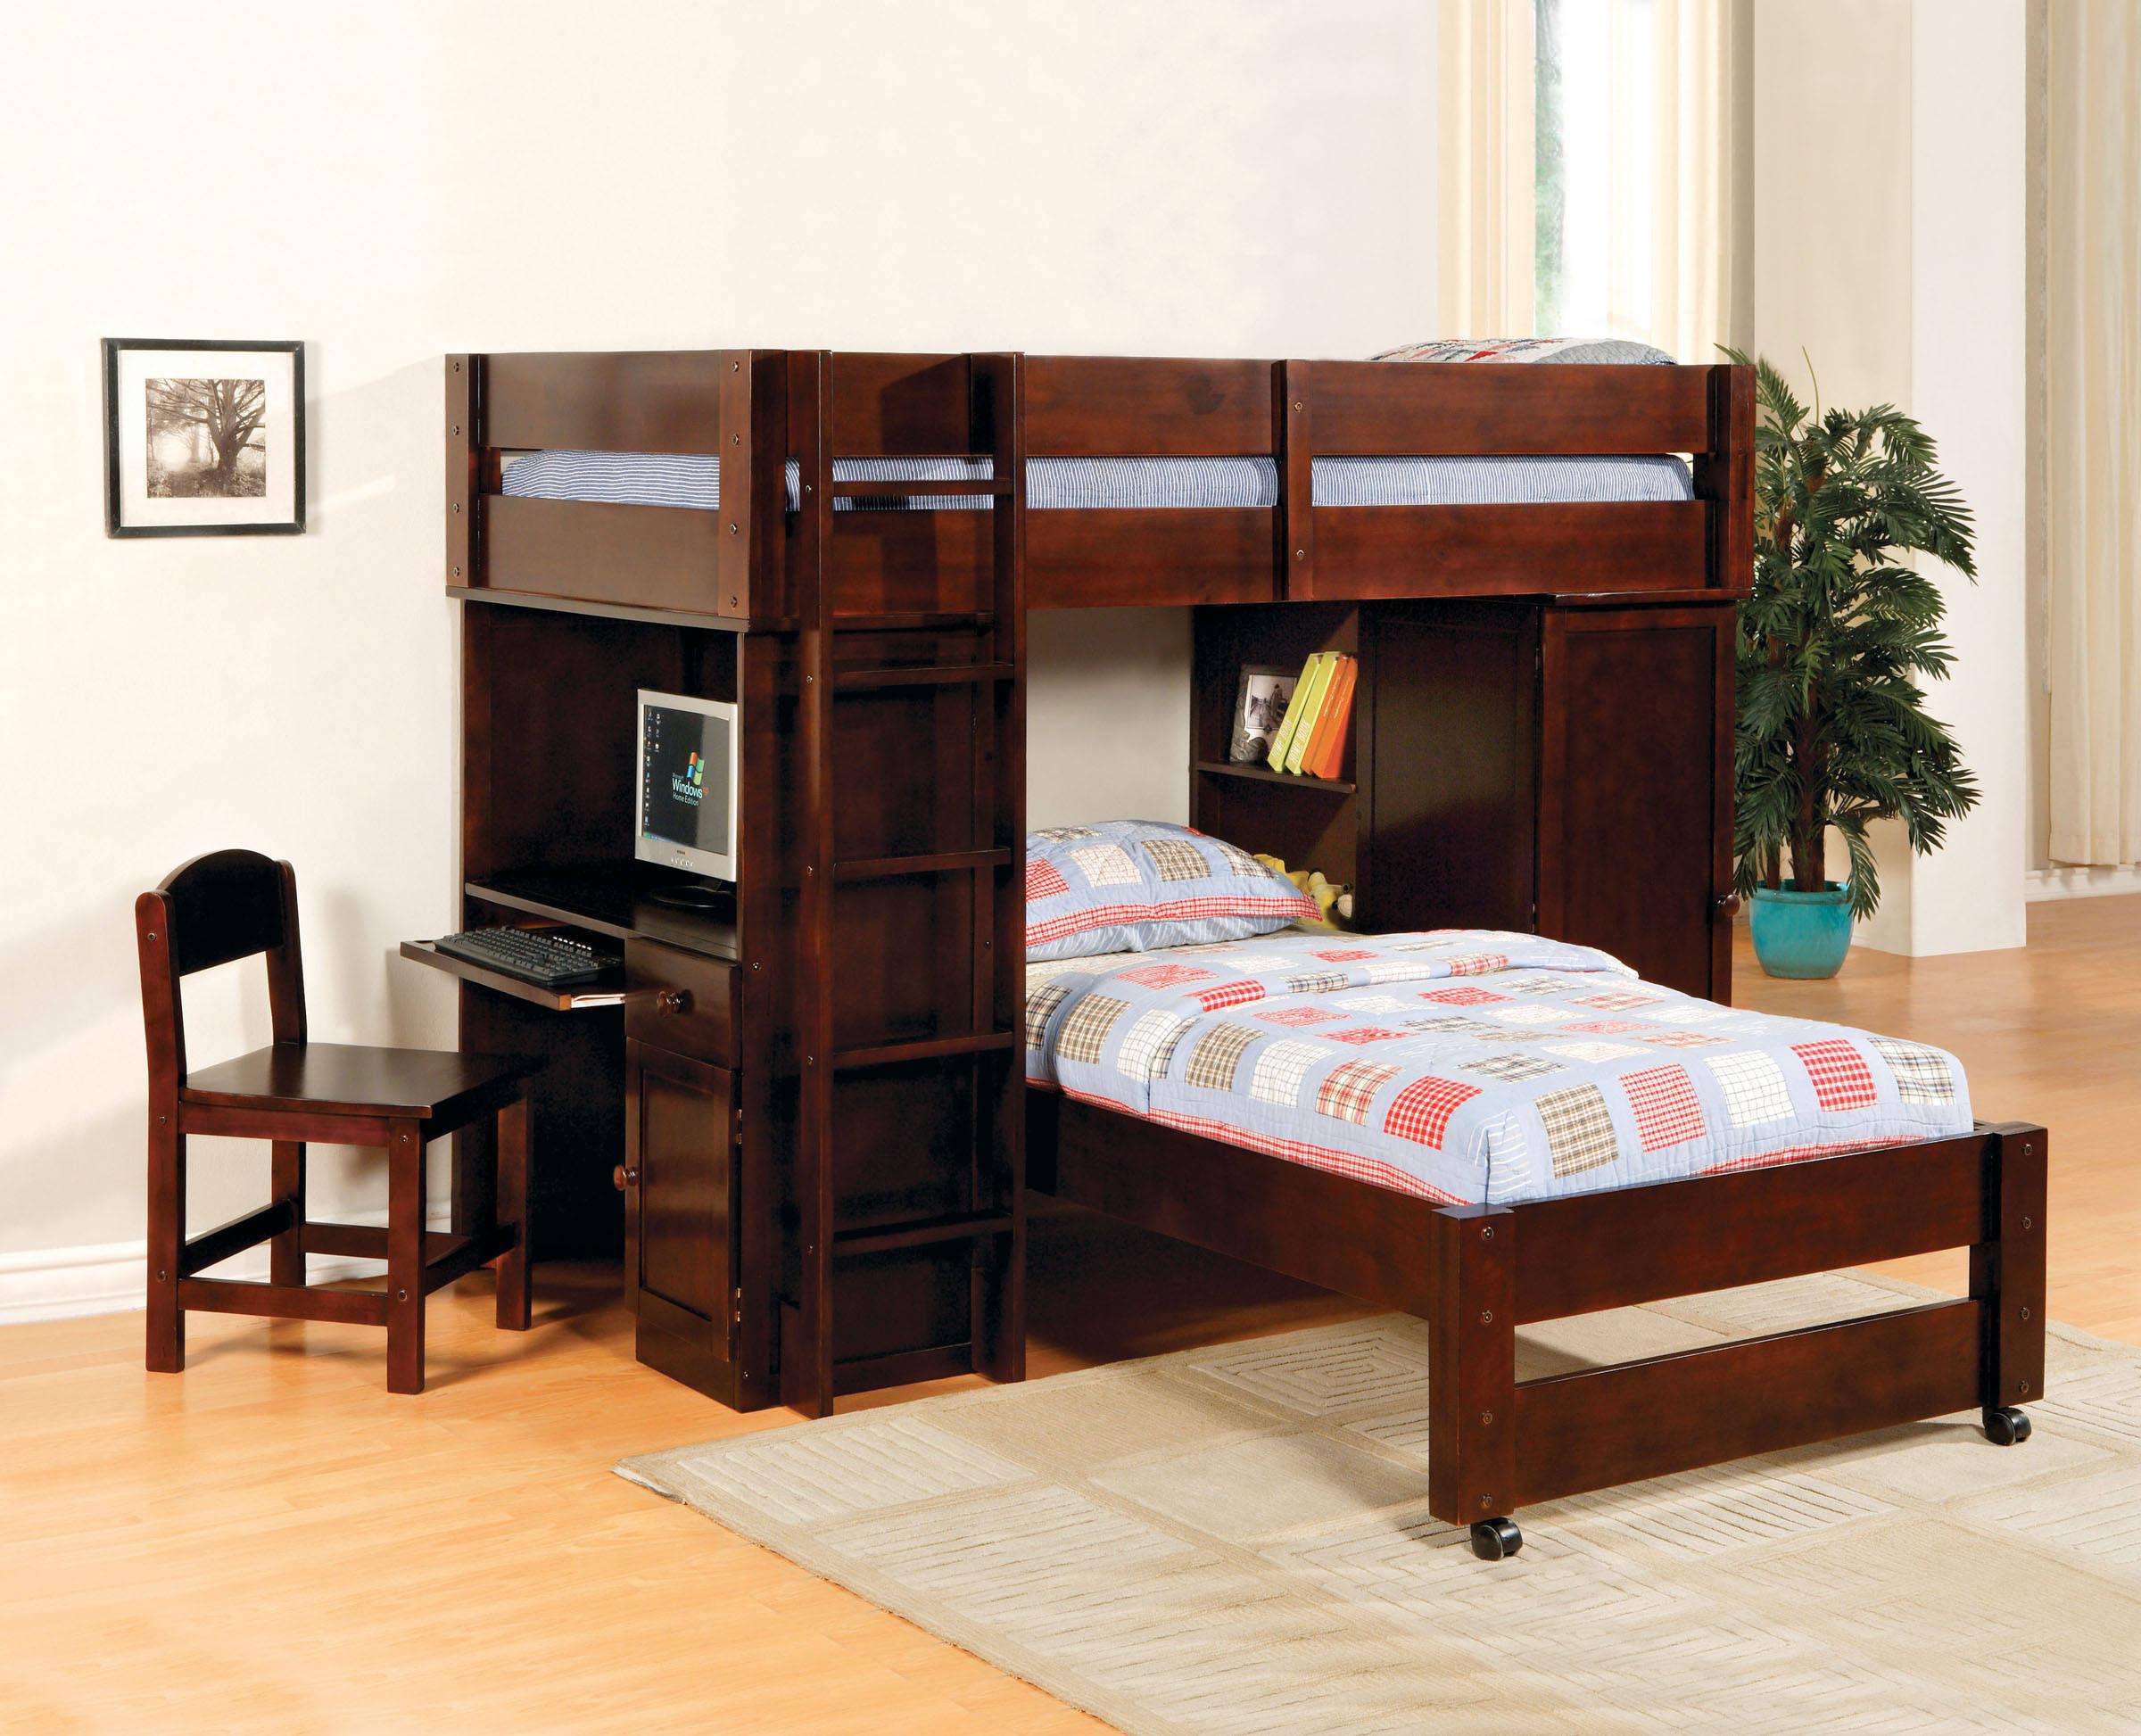 Harford Bunk Bed (P.O CM-BK529)